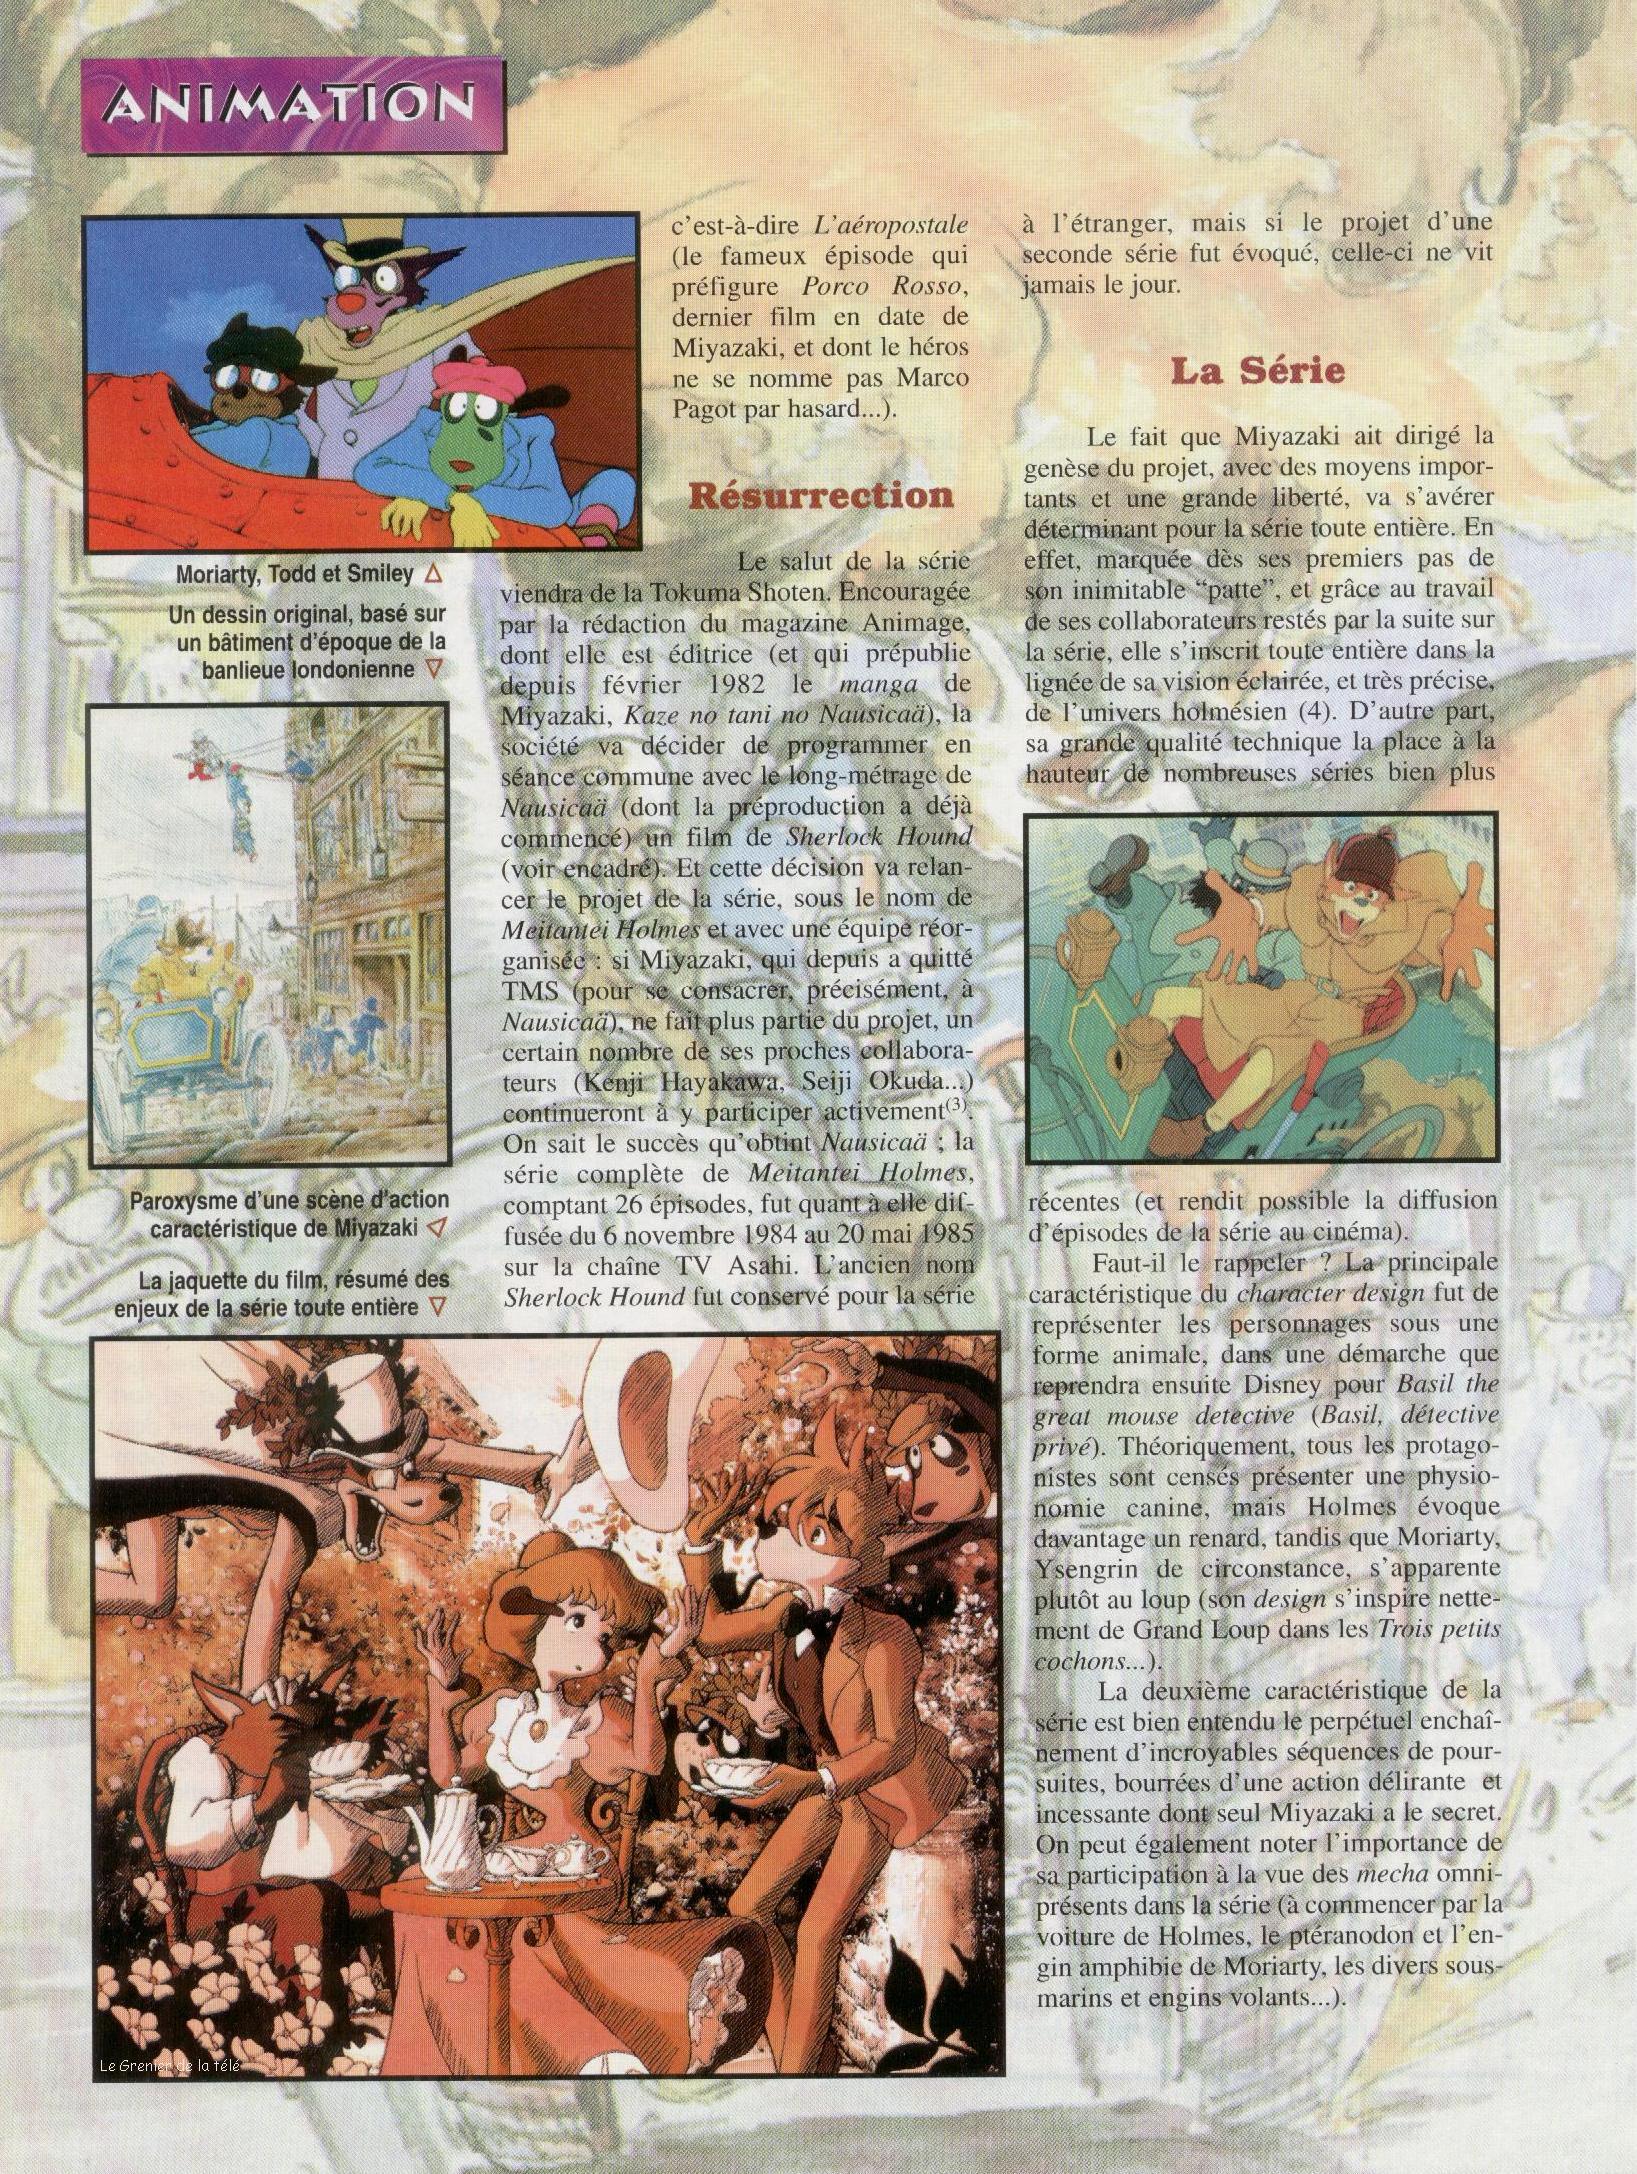 http://grenierdelatv.free.fr/sherlockholmesal26oct199602.jpg